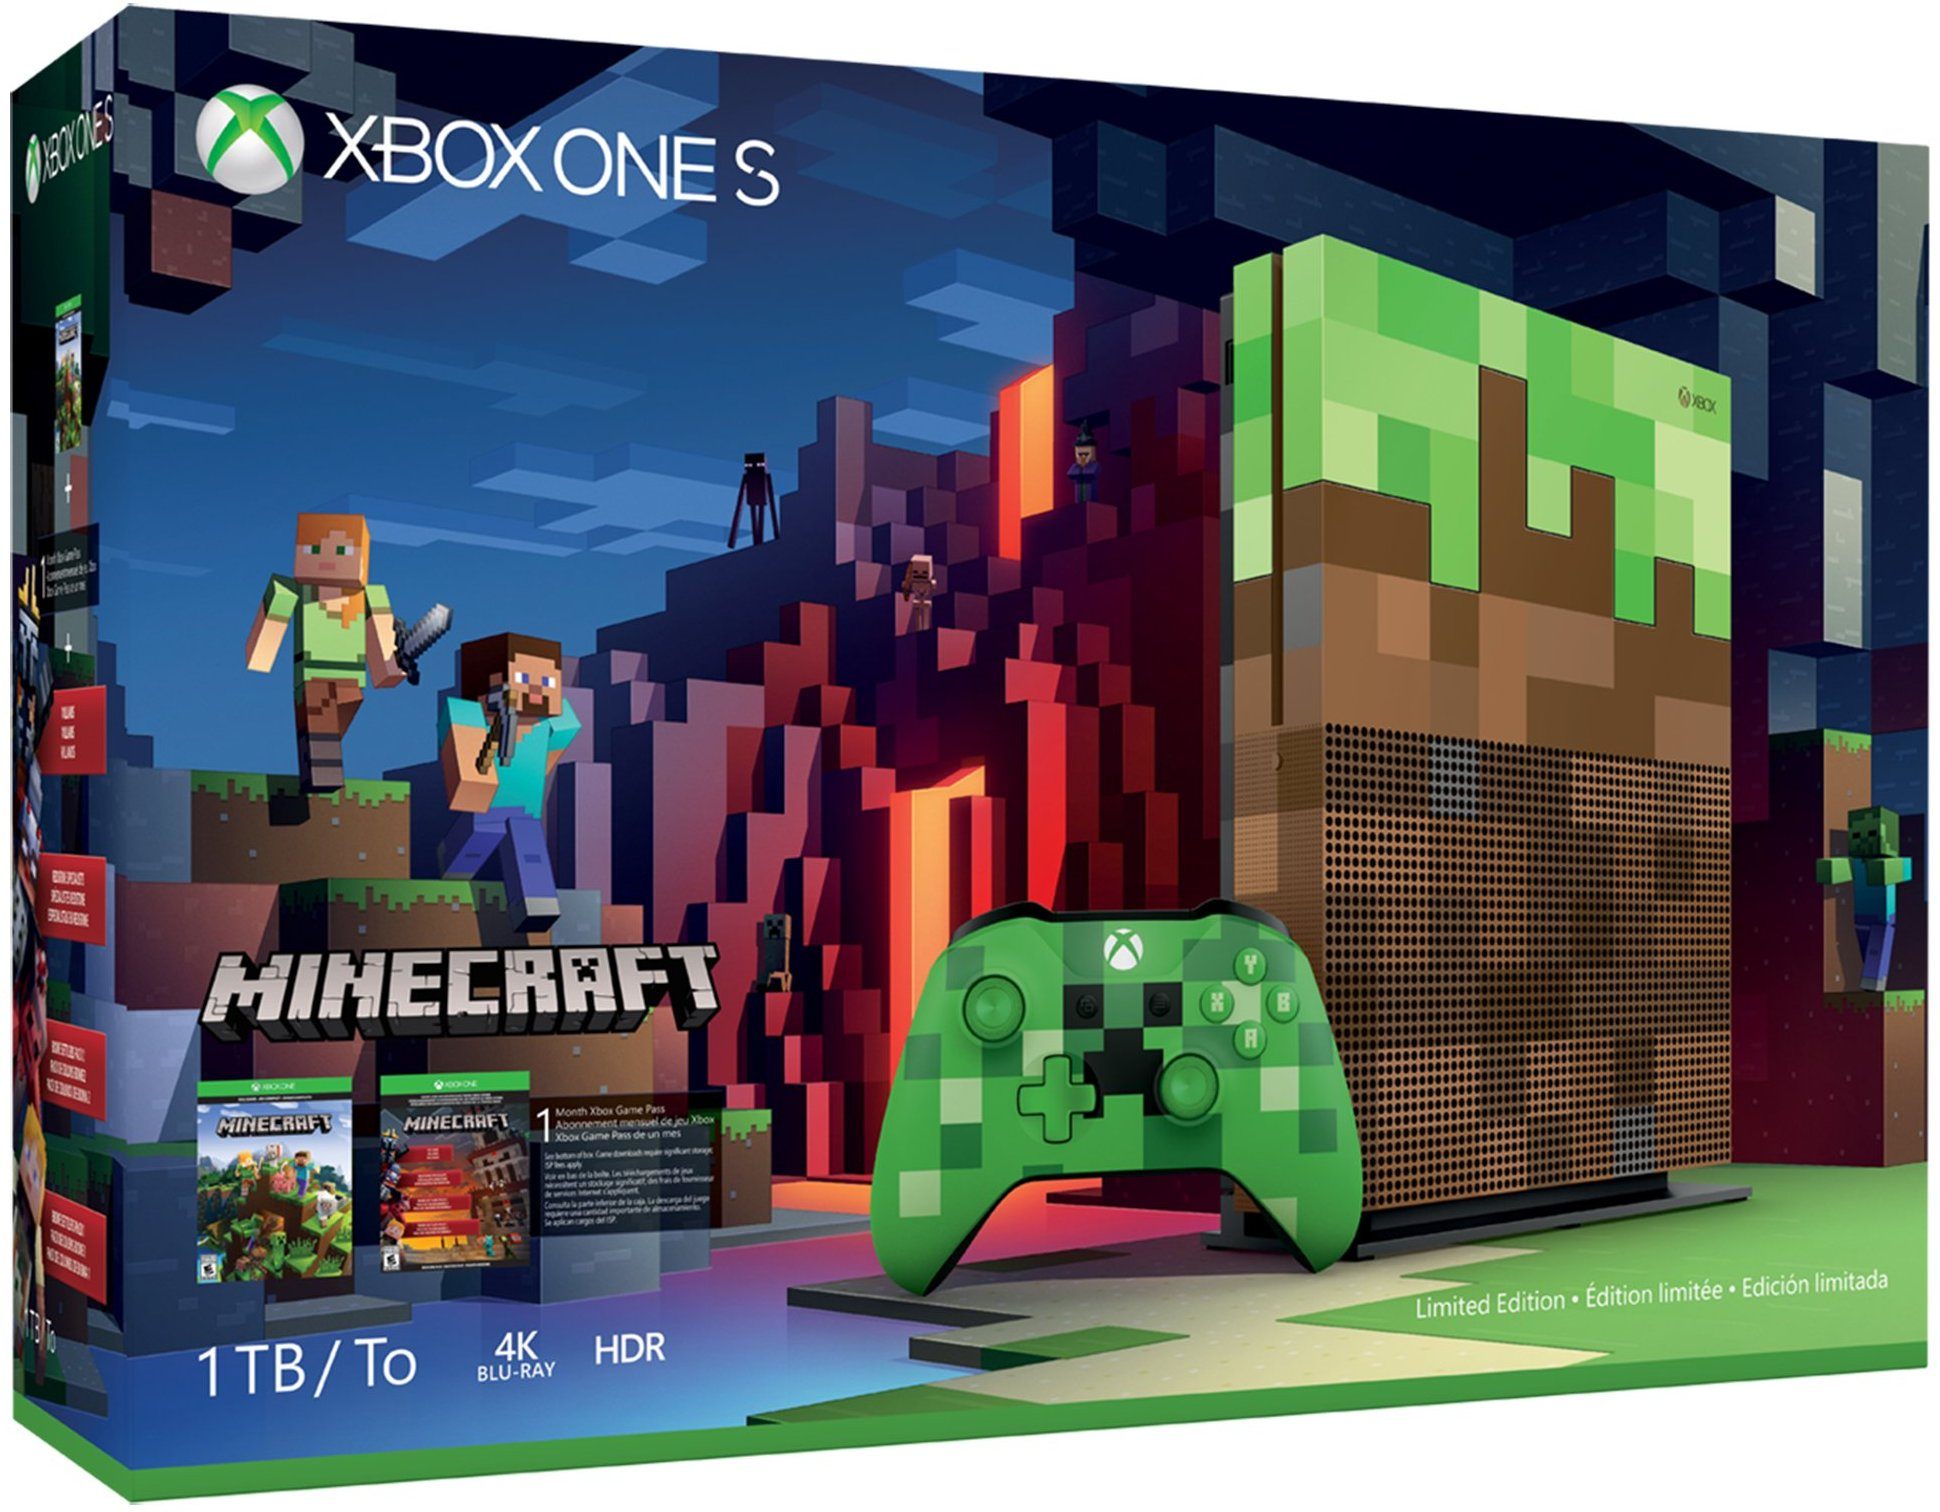 Microsoft Xbox One S 1TB Minecraft Limited Edition Bundle, 23C-00001